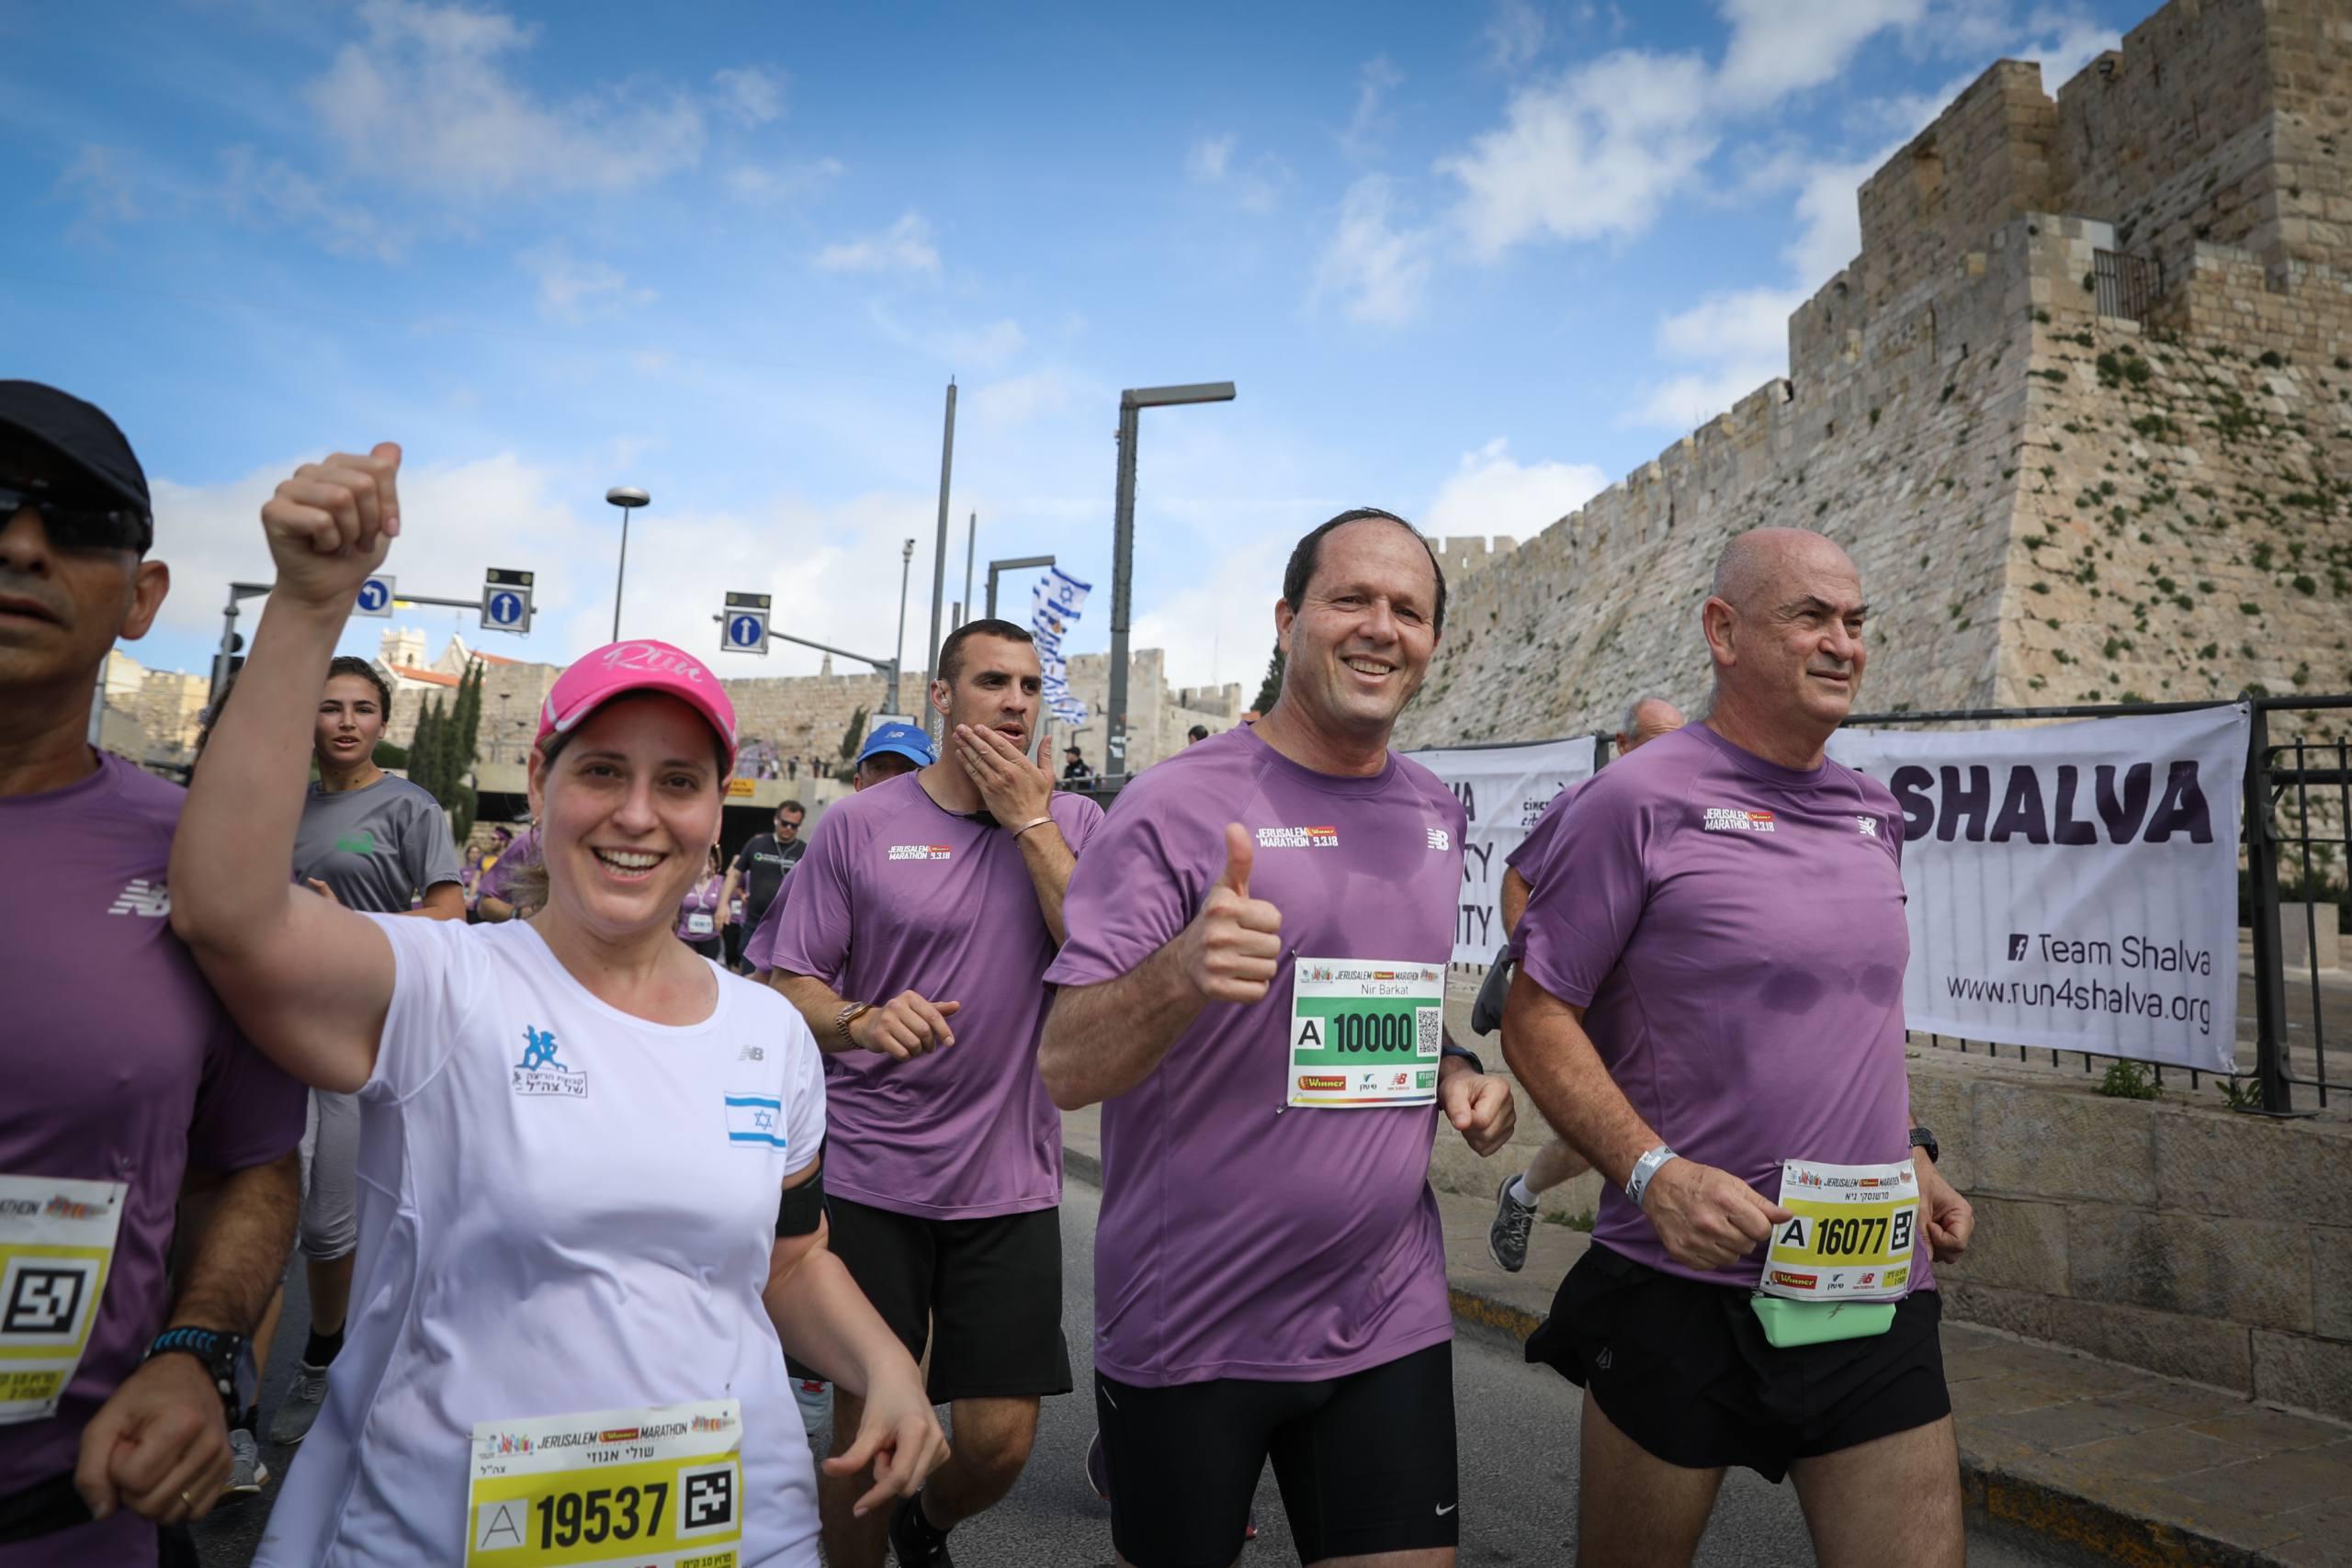 Jerusalem Mayor Nir Barkat take part in the 2018 international Jerusalem Marathon on March 9, 2018. Photo by Noam Revkin Fenton/Flash90 *** Local Caption *** ספורט ריצה מרתון ירושלים רצים 2018